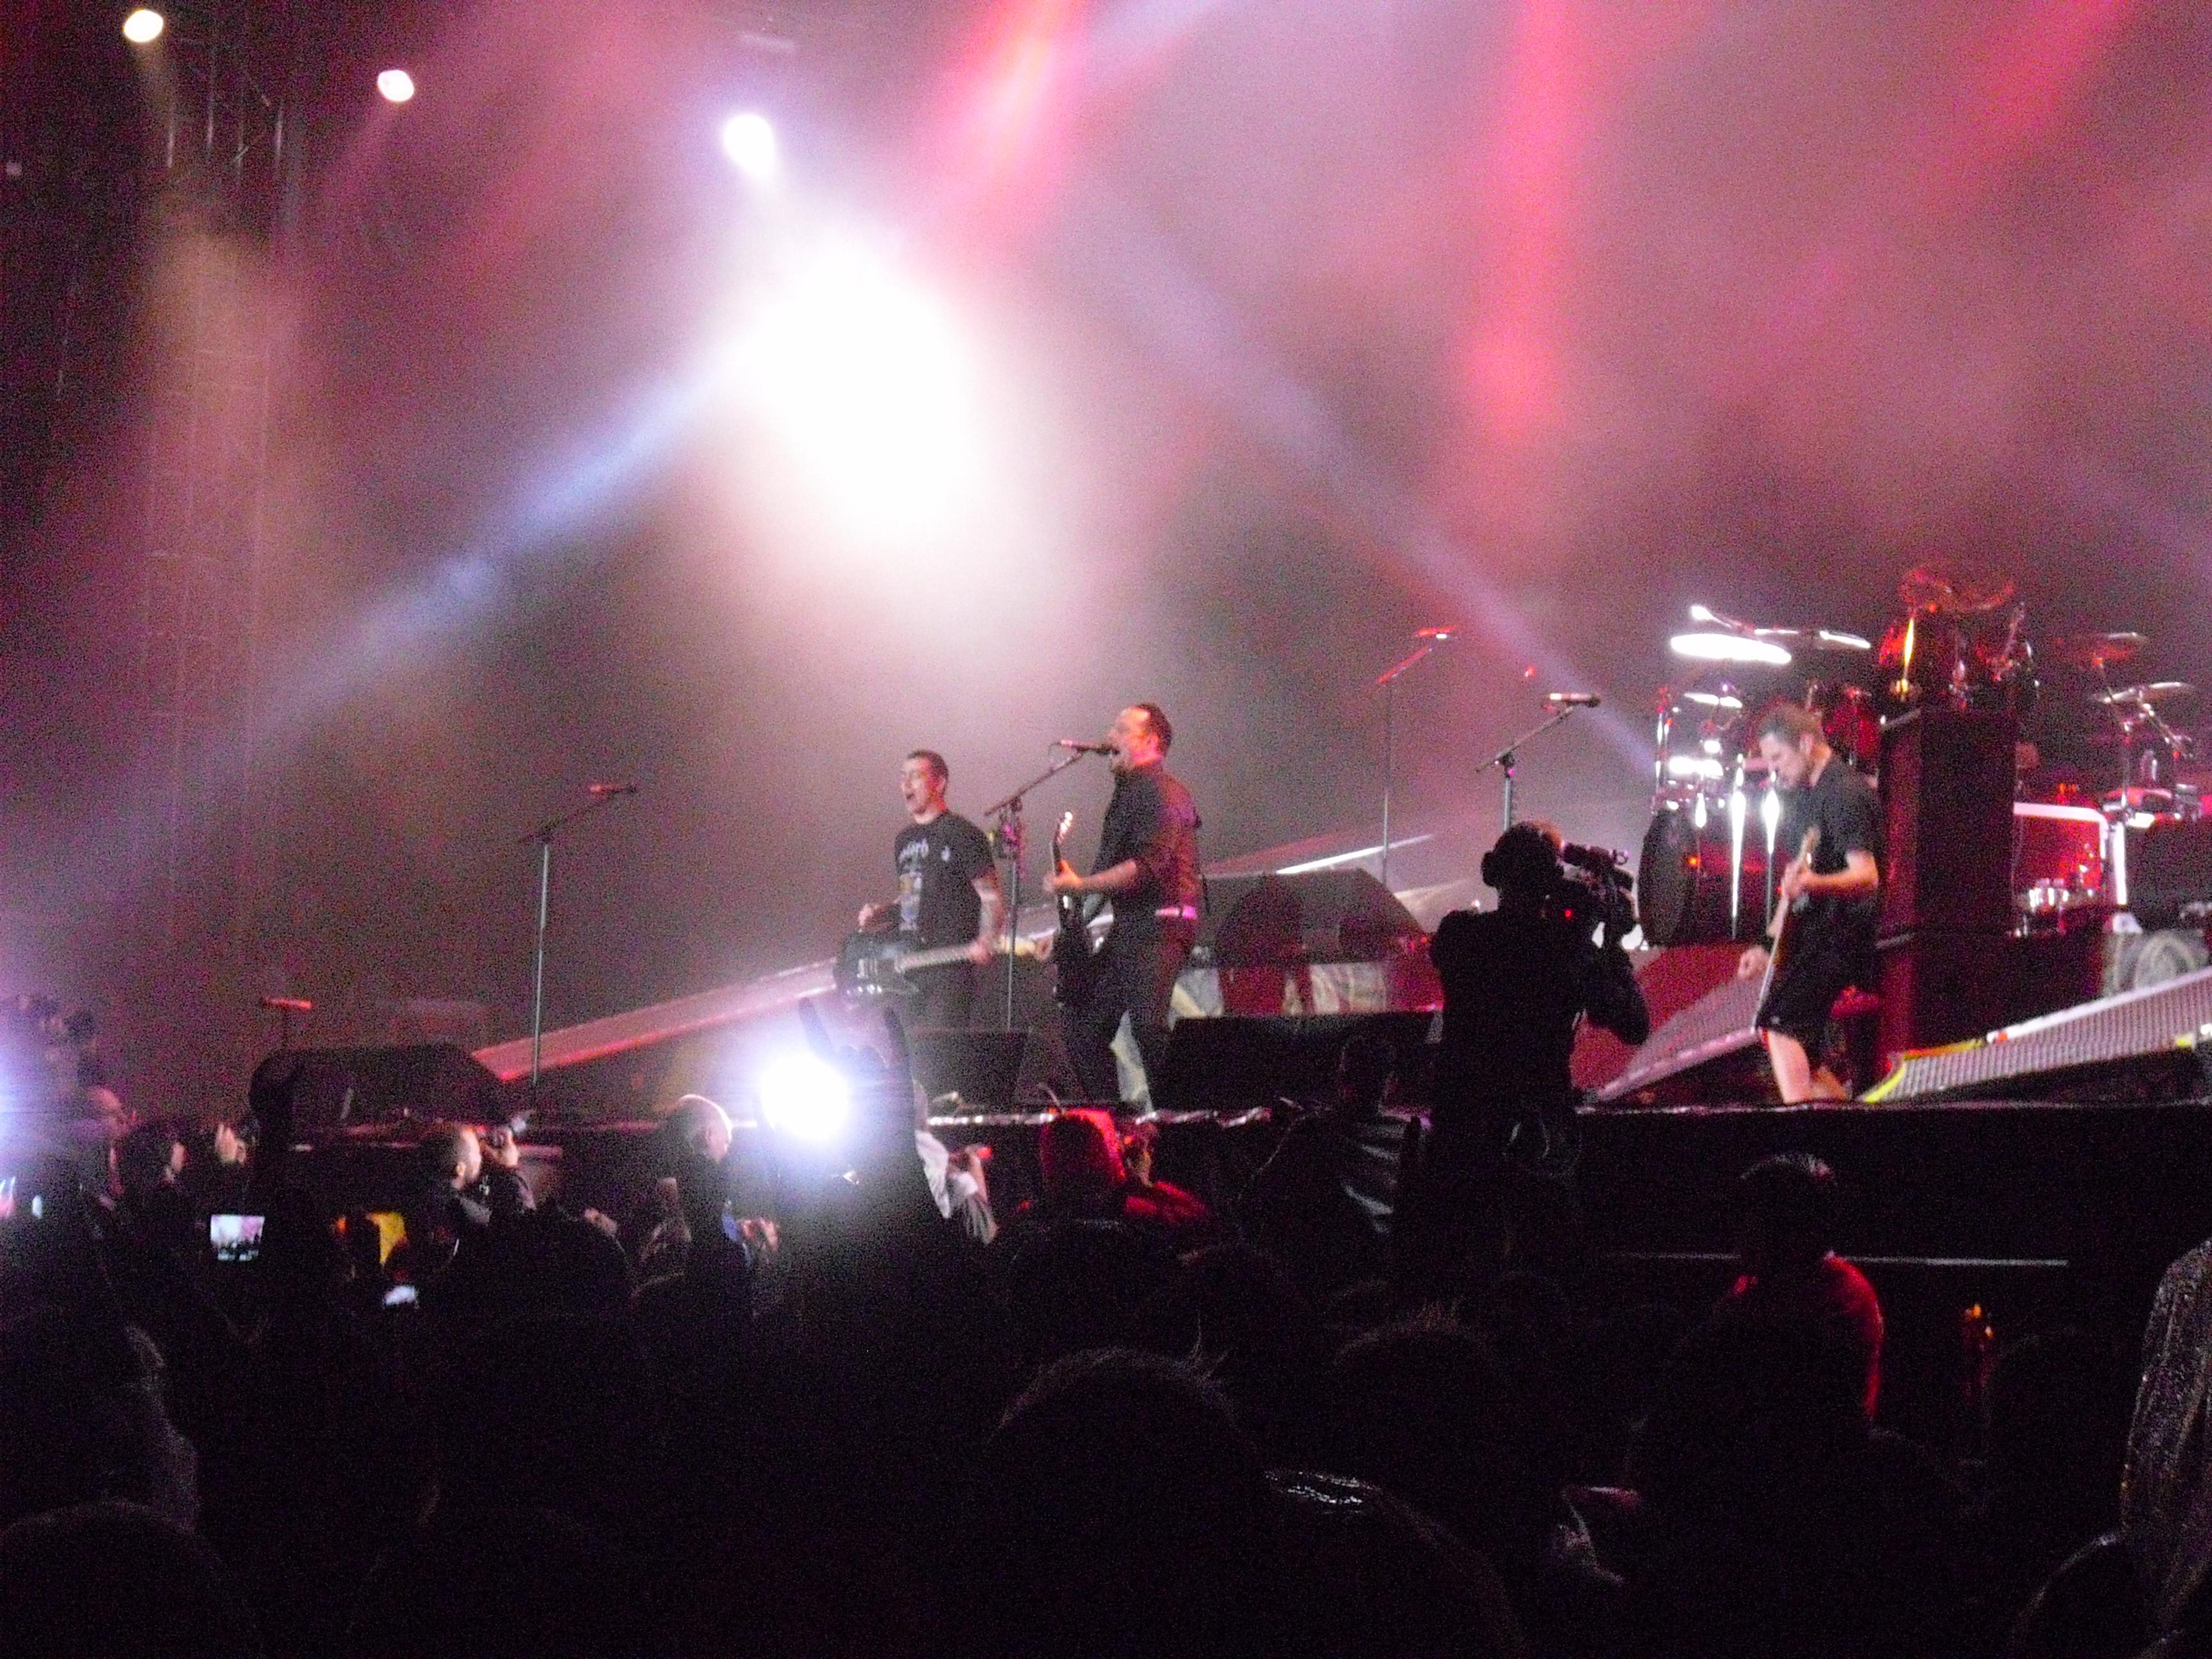 Fichier:Volbeat-Live-Metaltown 2011 jpg — Wikipédia